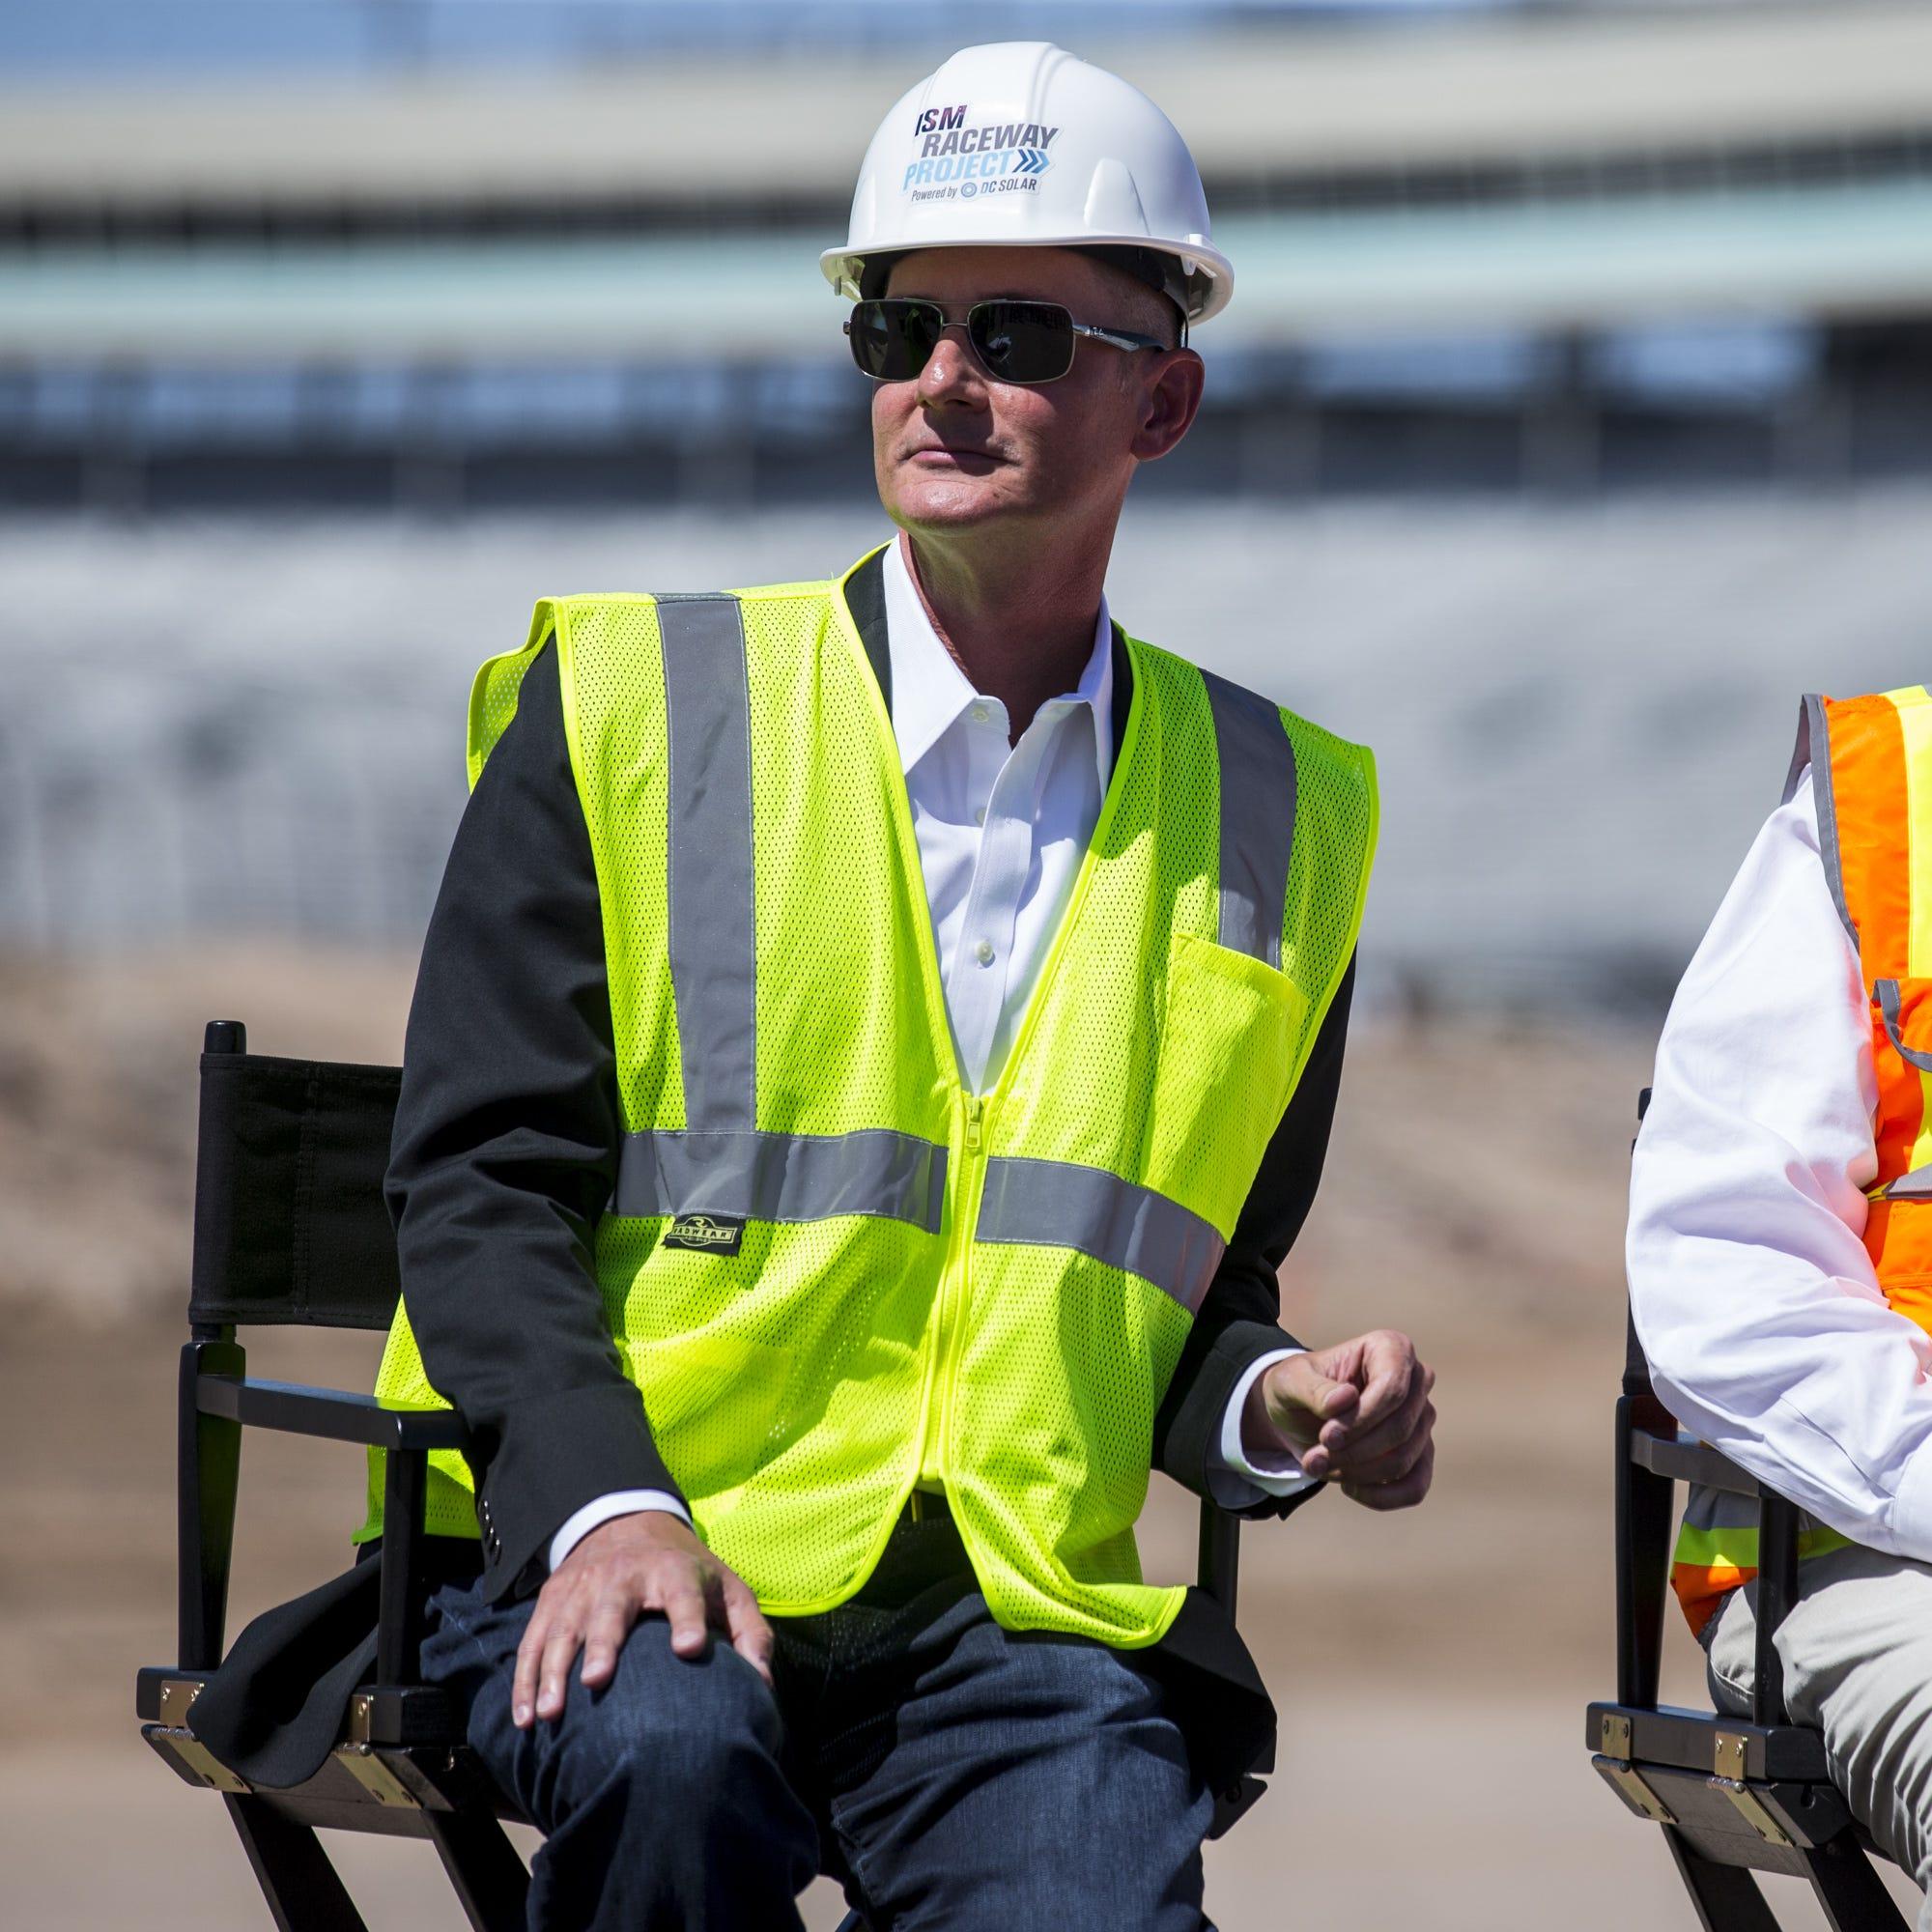 Bryan Sperber stepping down as ISM Raceway president after November NASCAR race